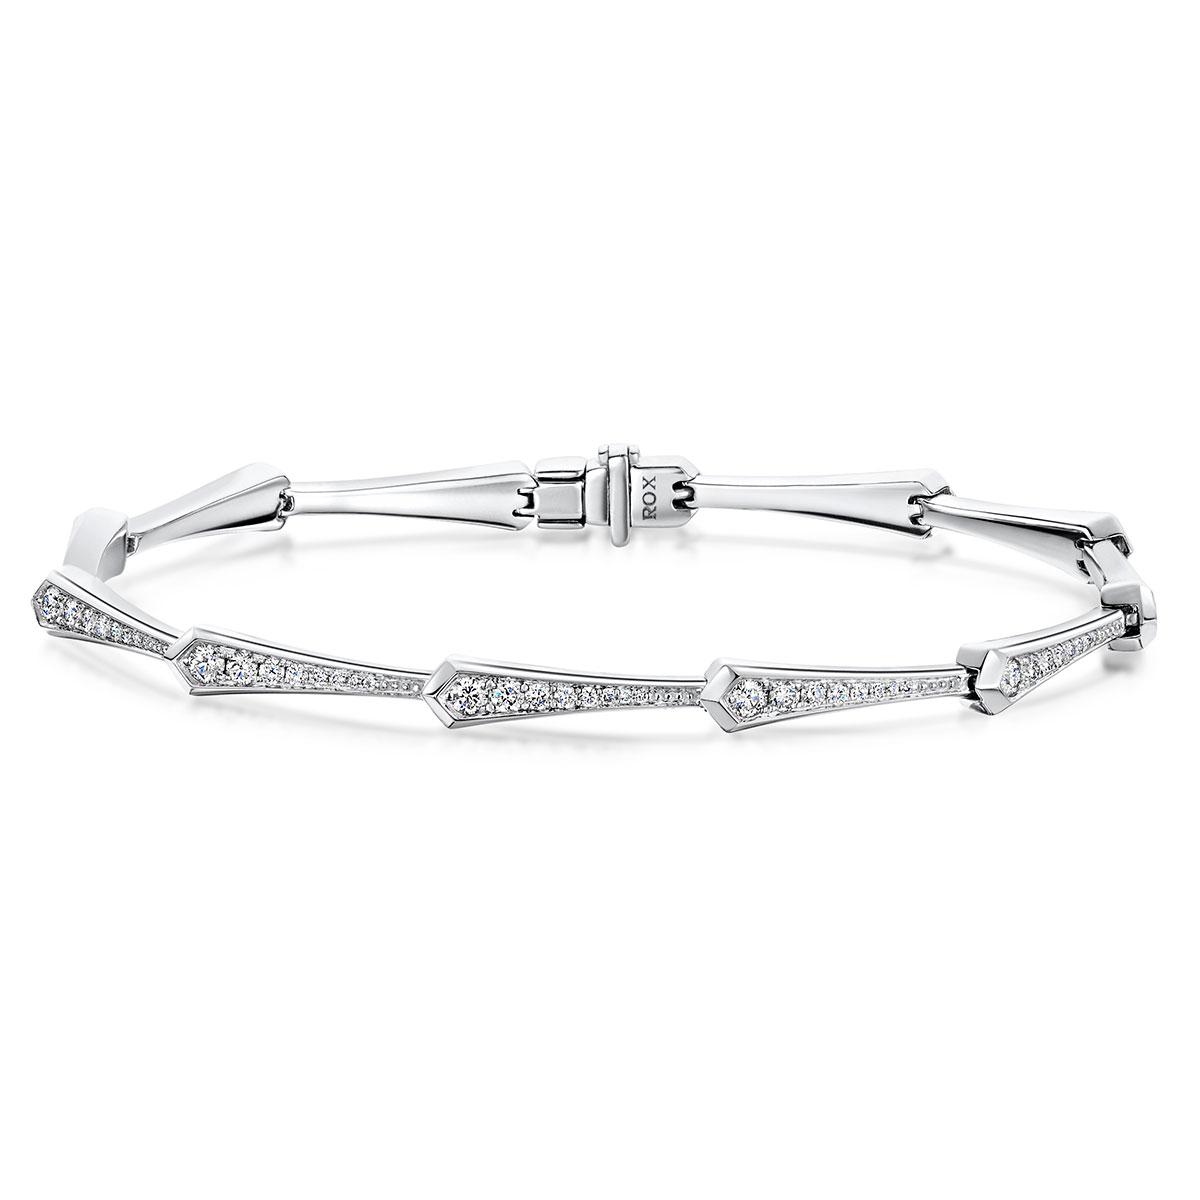 ROX Cosmic Diamond Bracelet 1.29cts